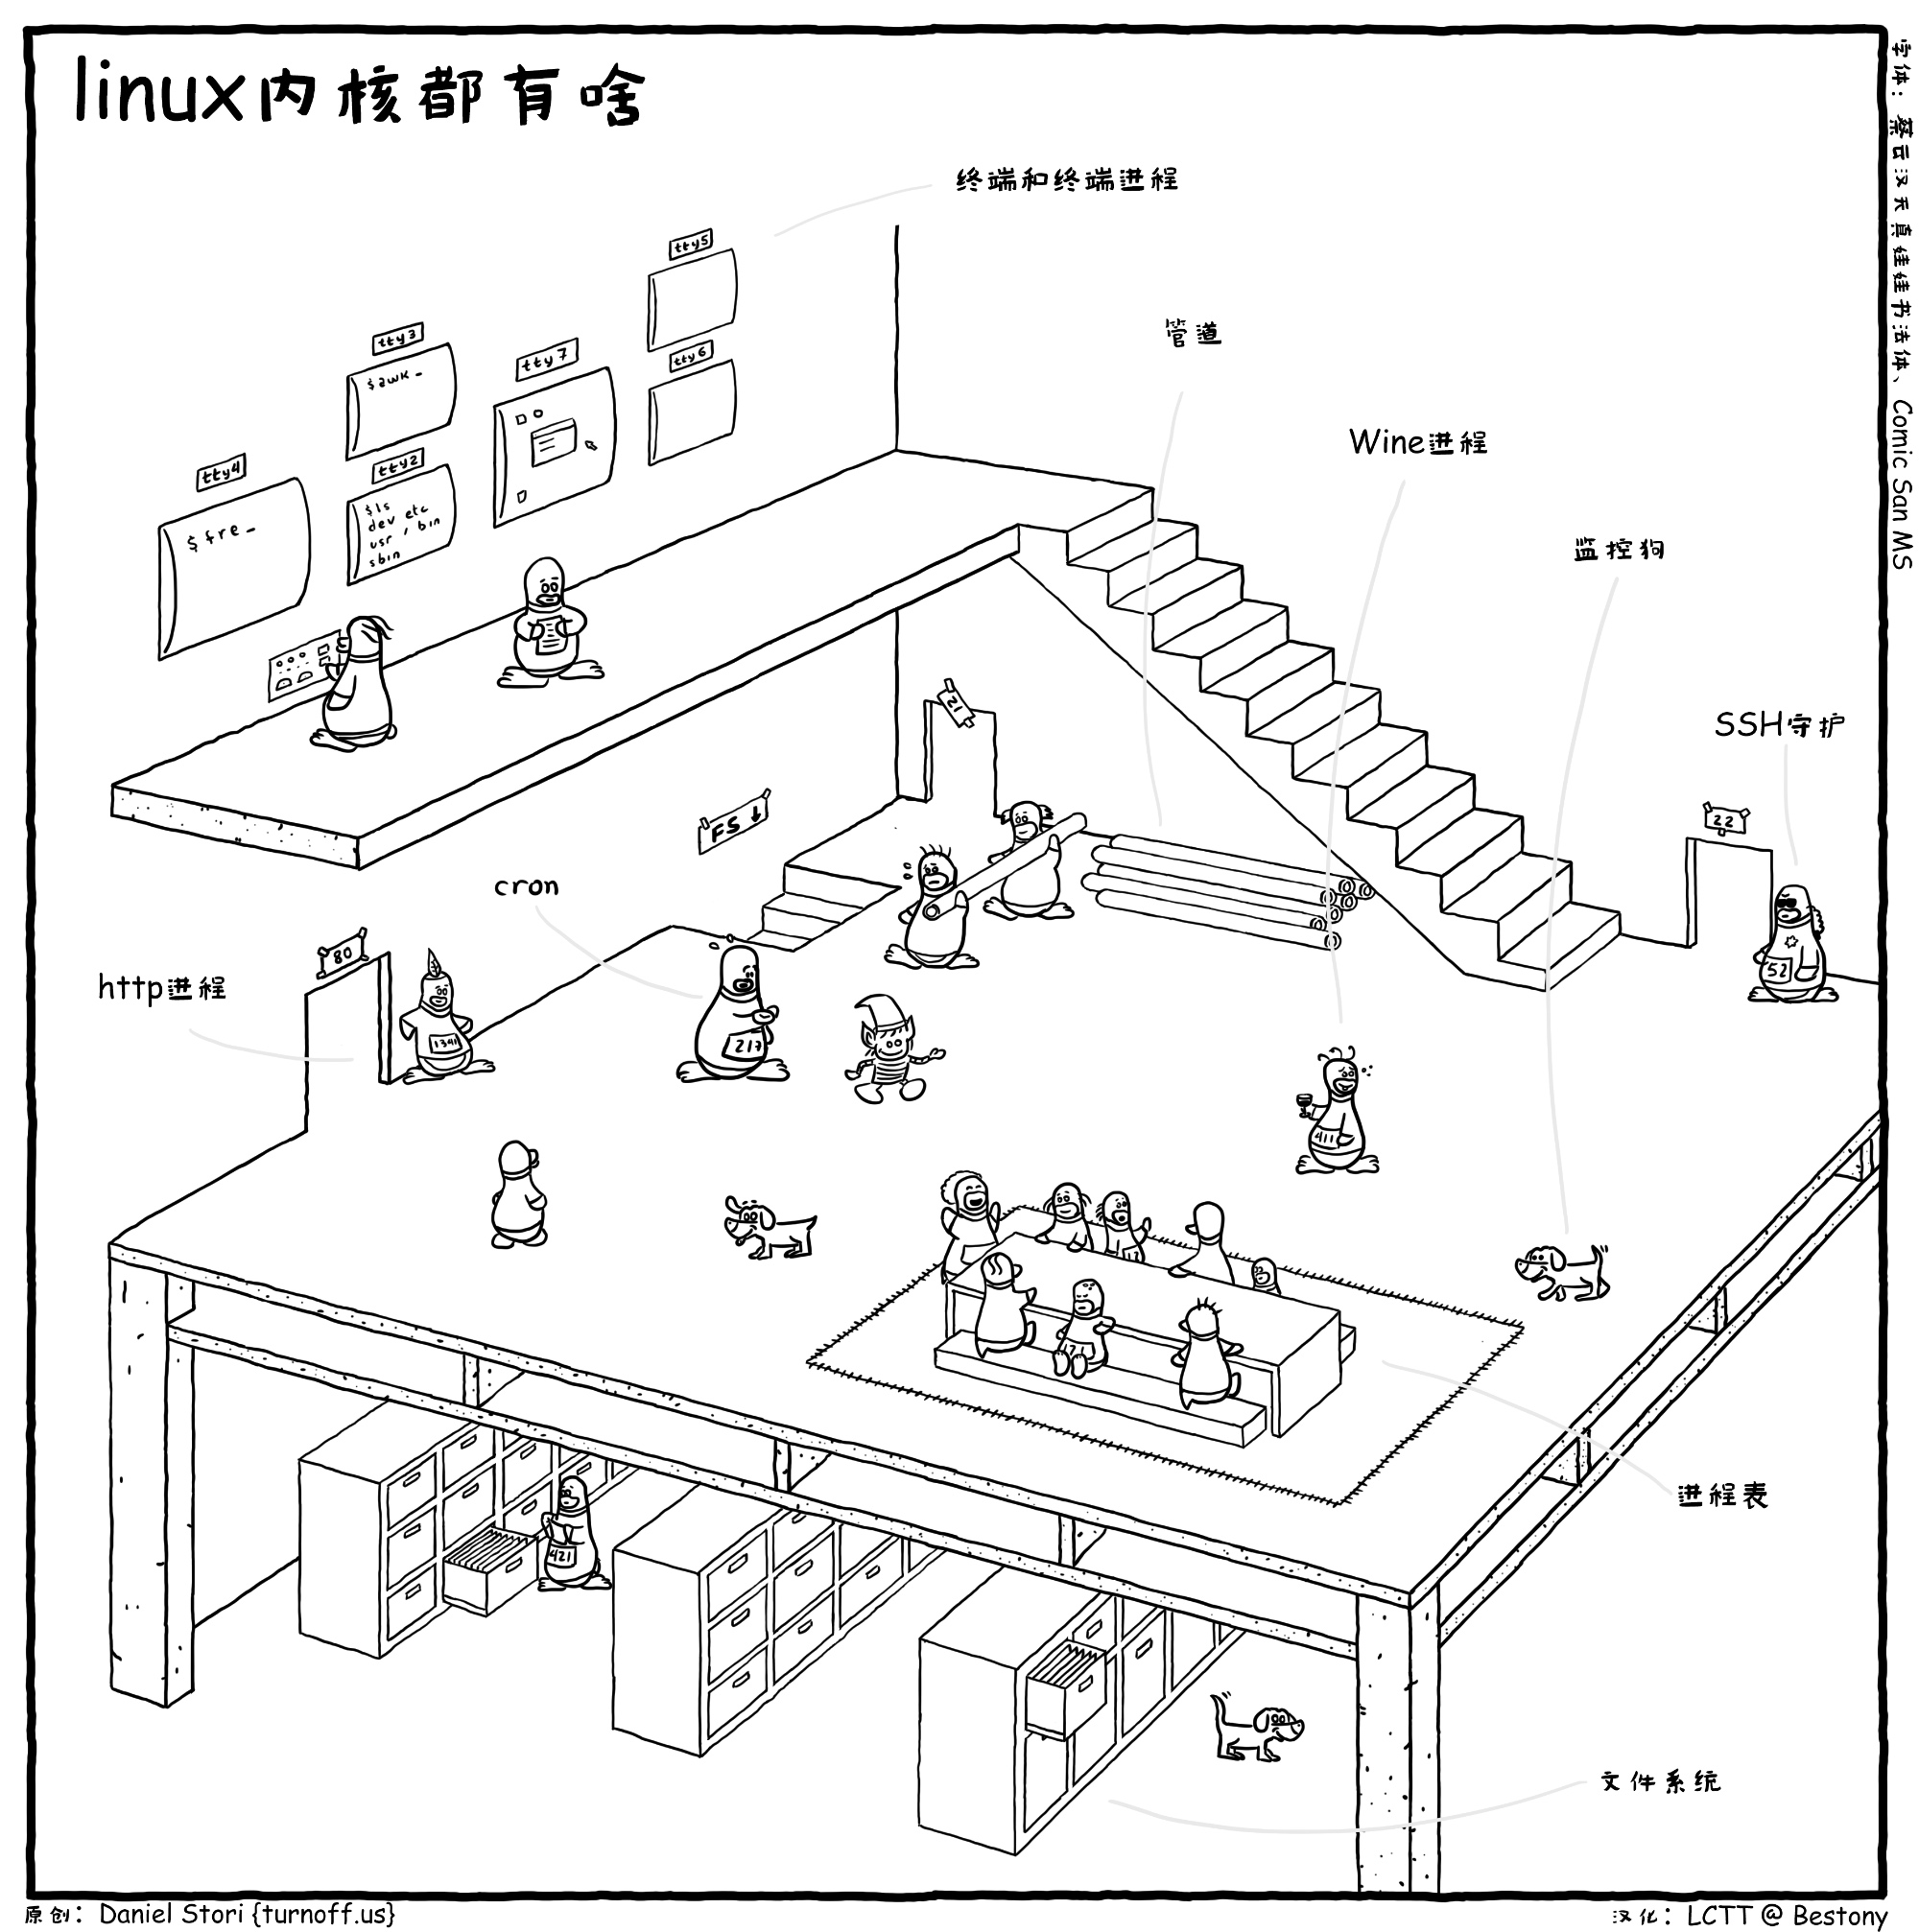 Linux 内核都有啥